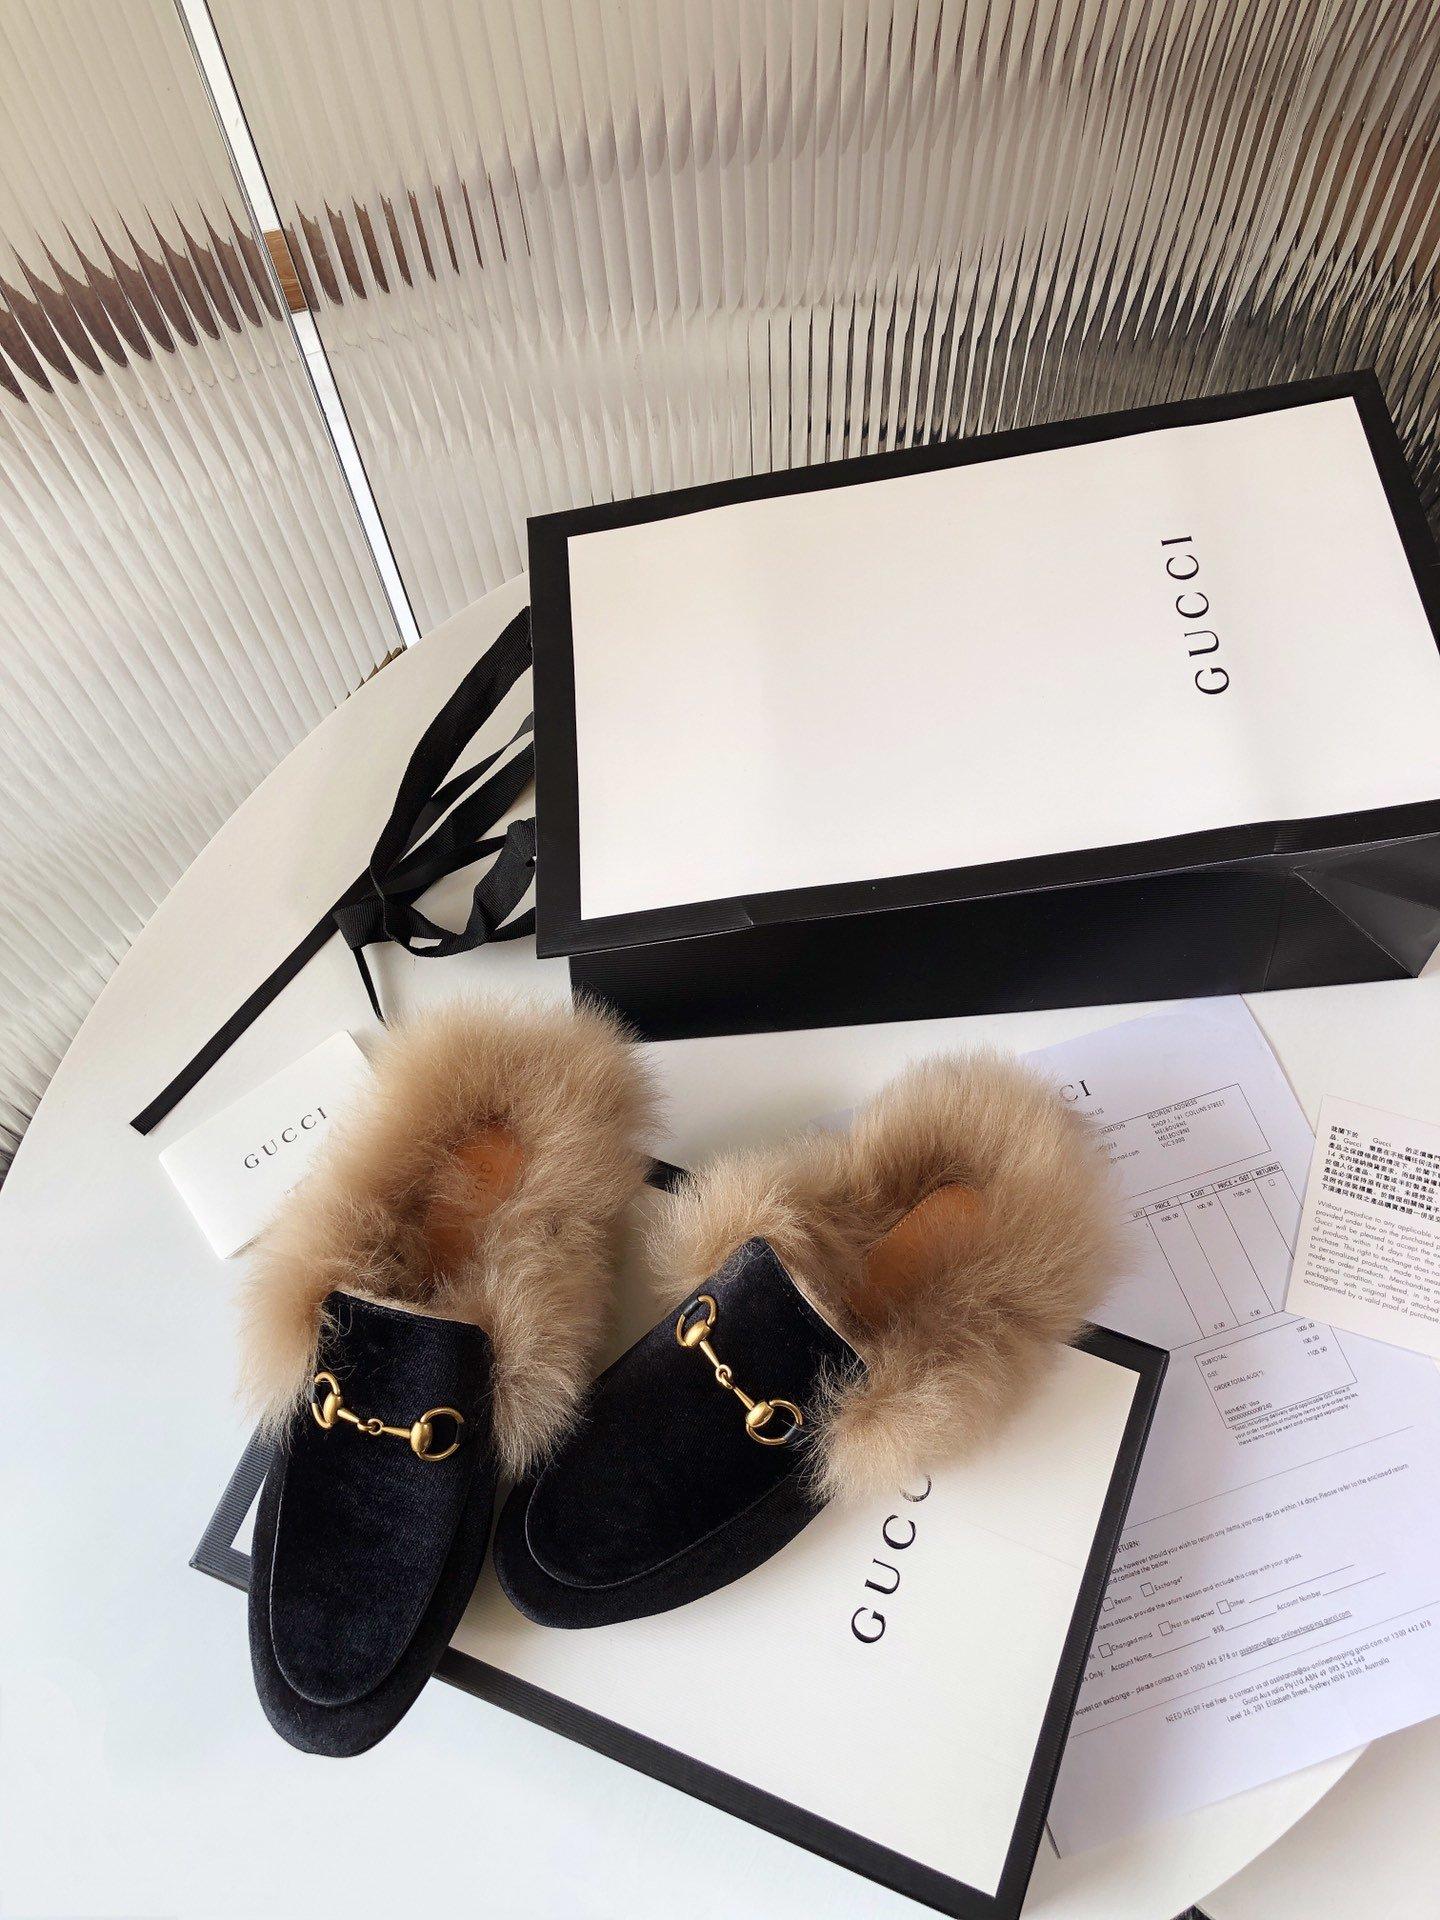 Gucci古奇 羔羊毛穆勒鞋高密度天鹅绒(图13)